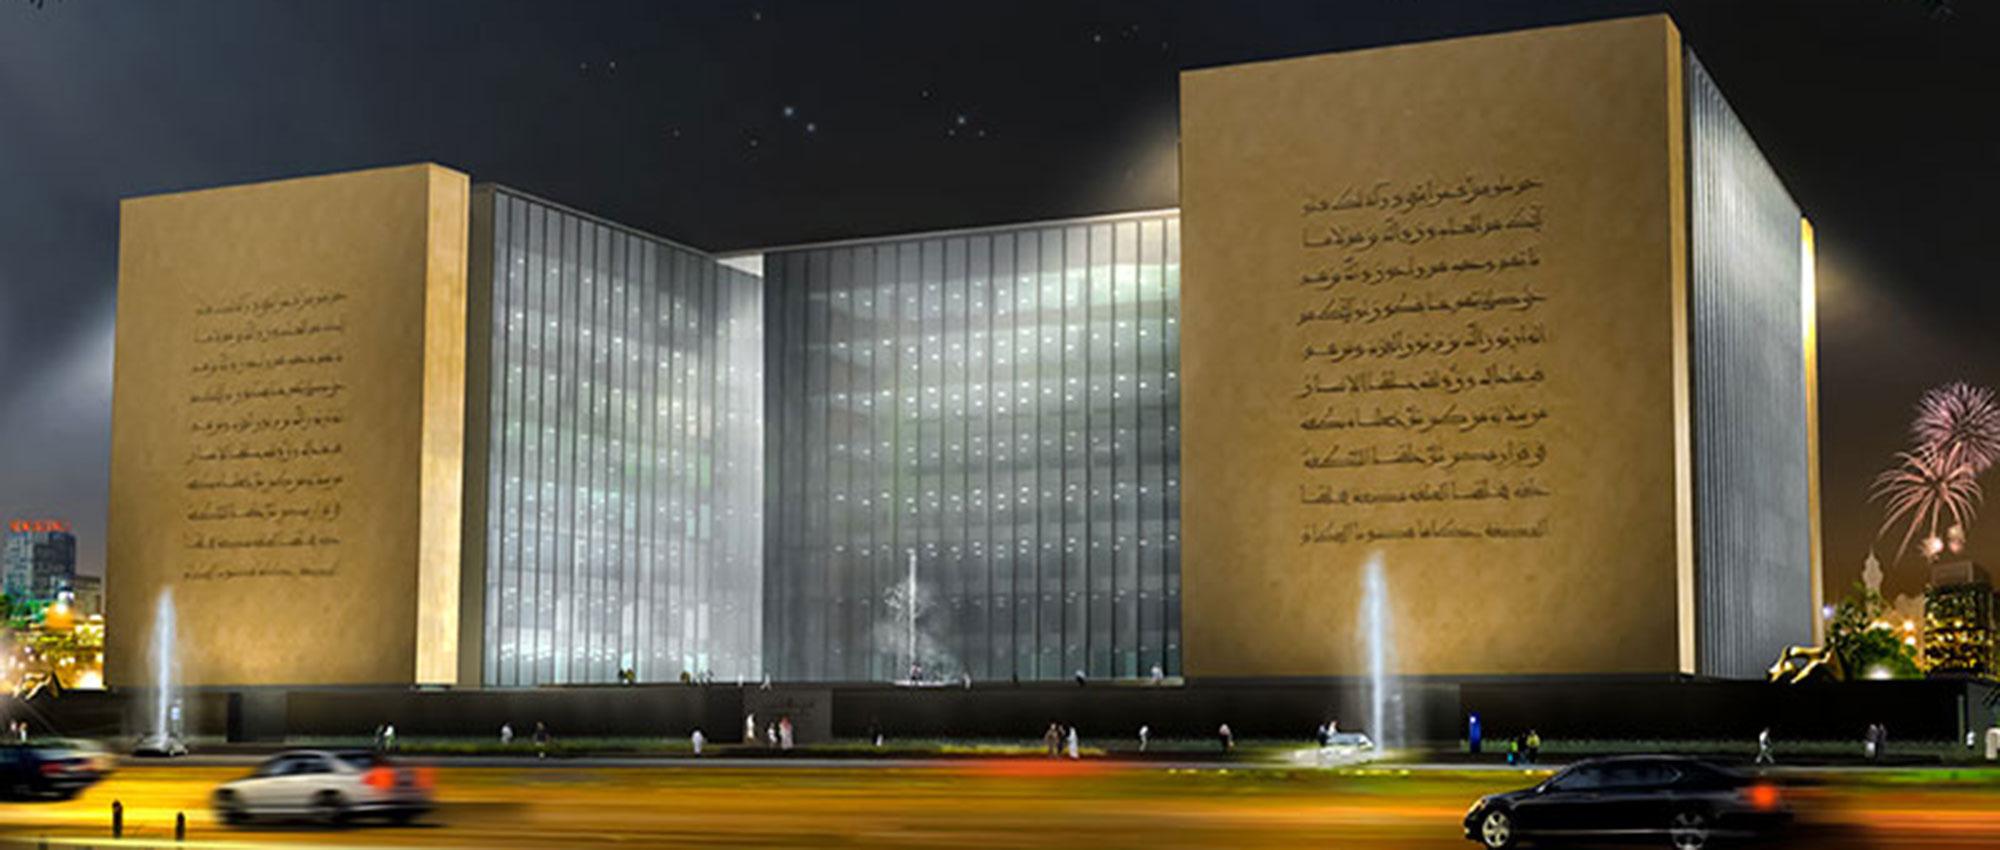 King Abdulaziz Center For National Dialogue